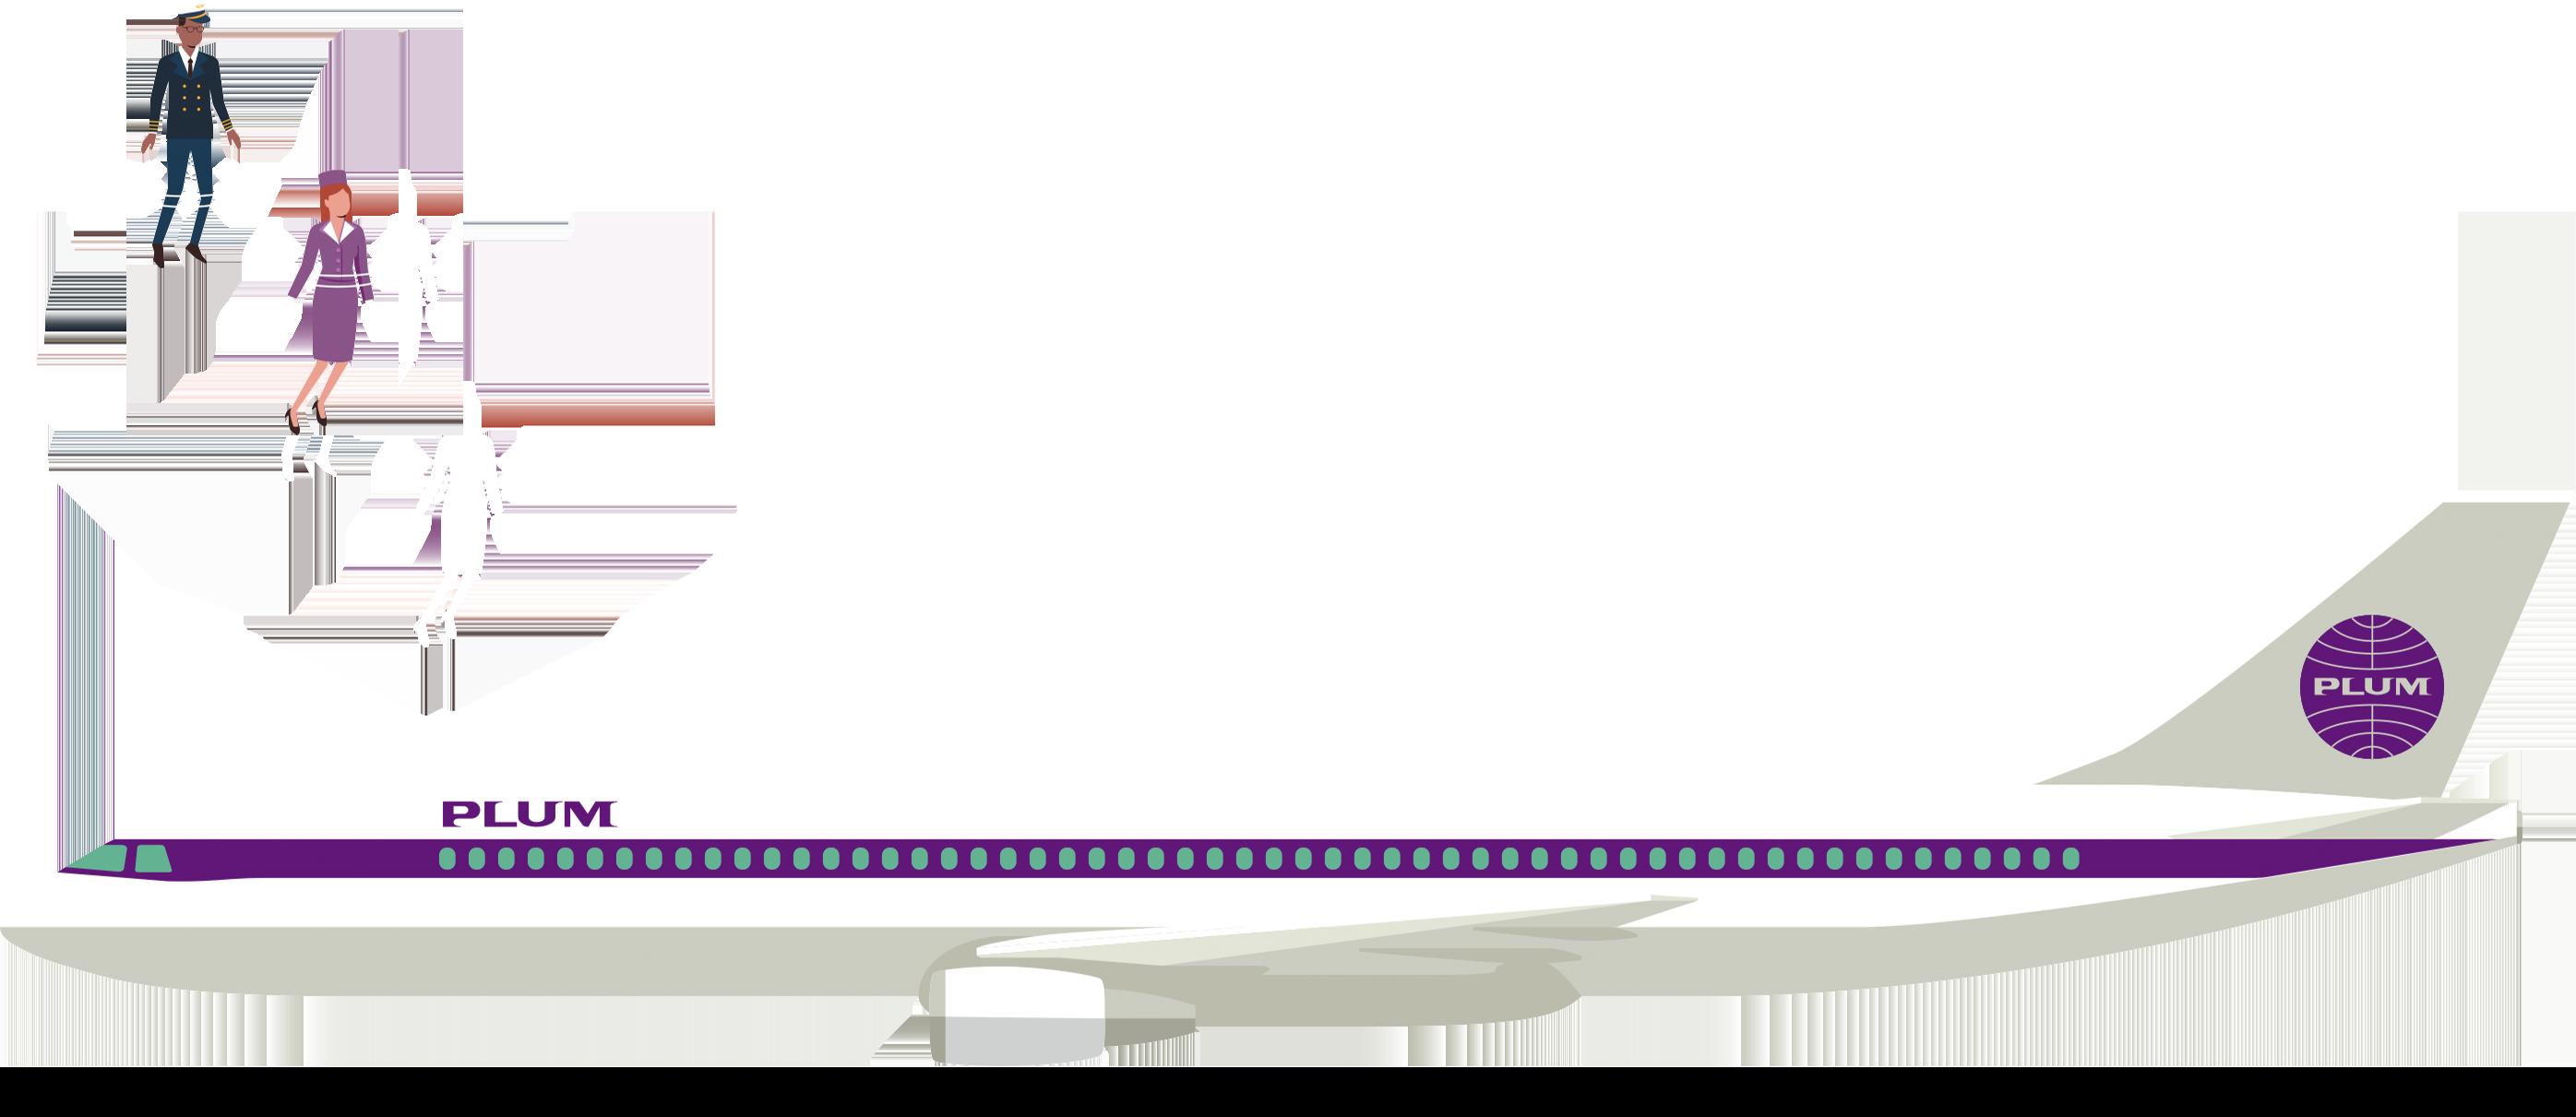 FY19Q4_plum_plane (1)